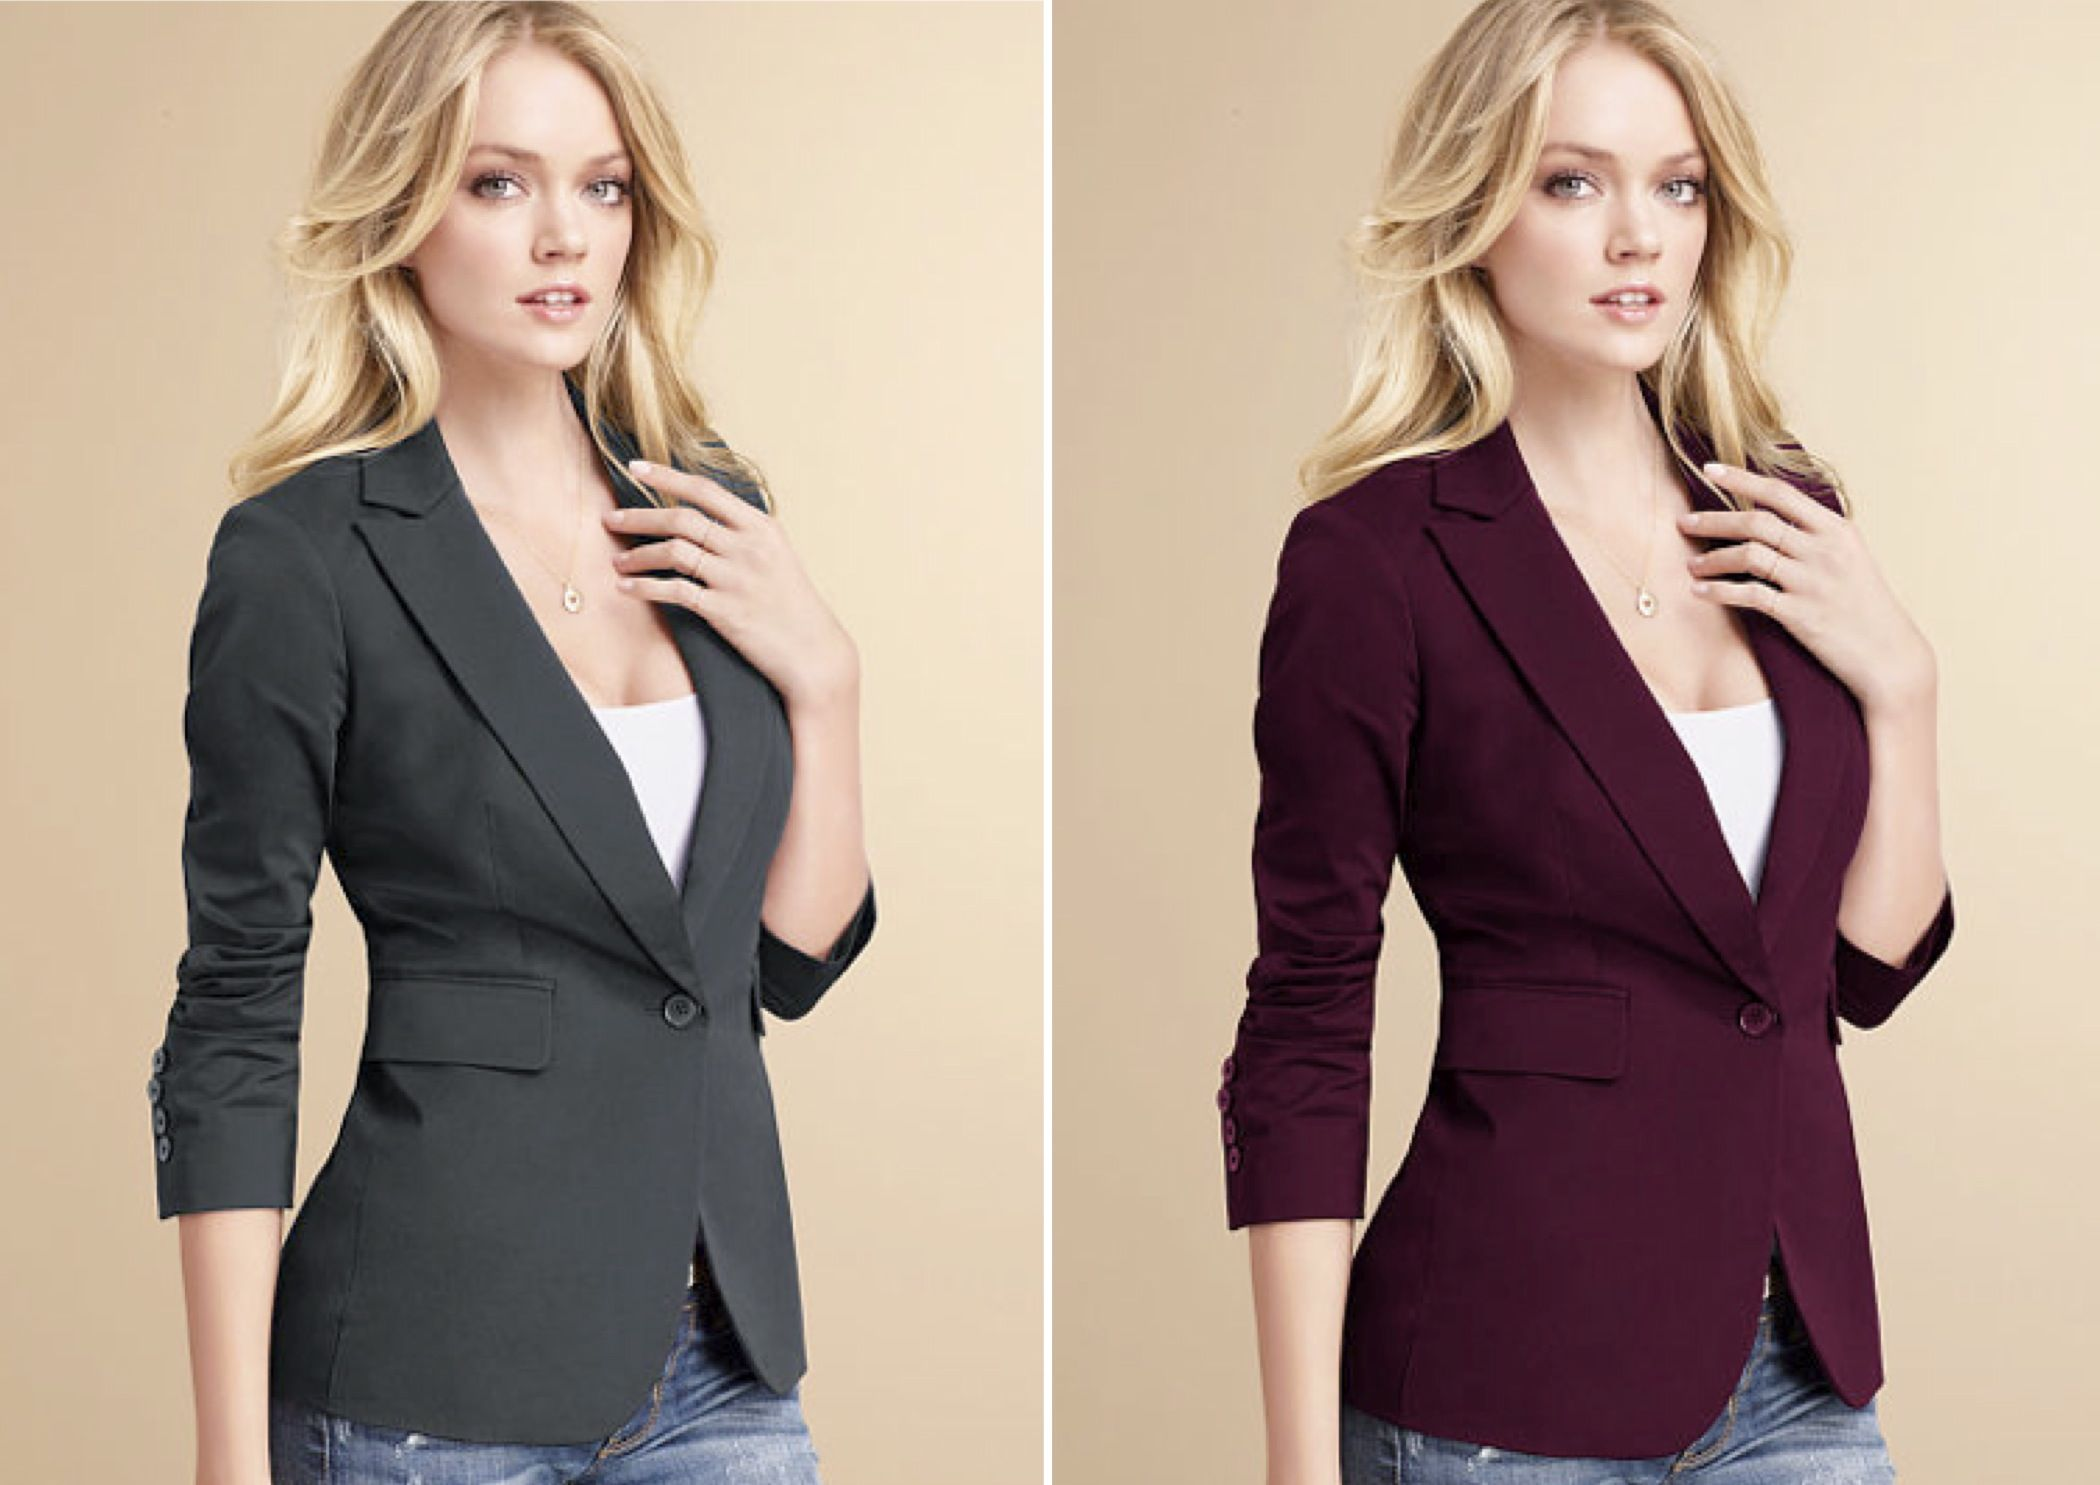 Modelos De Sacos De Vestir Para Mujer Sacos De Vestir